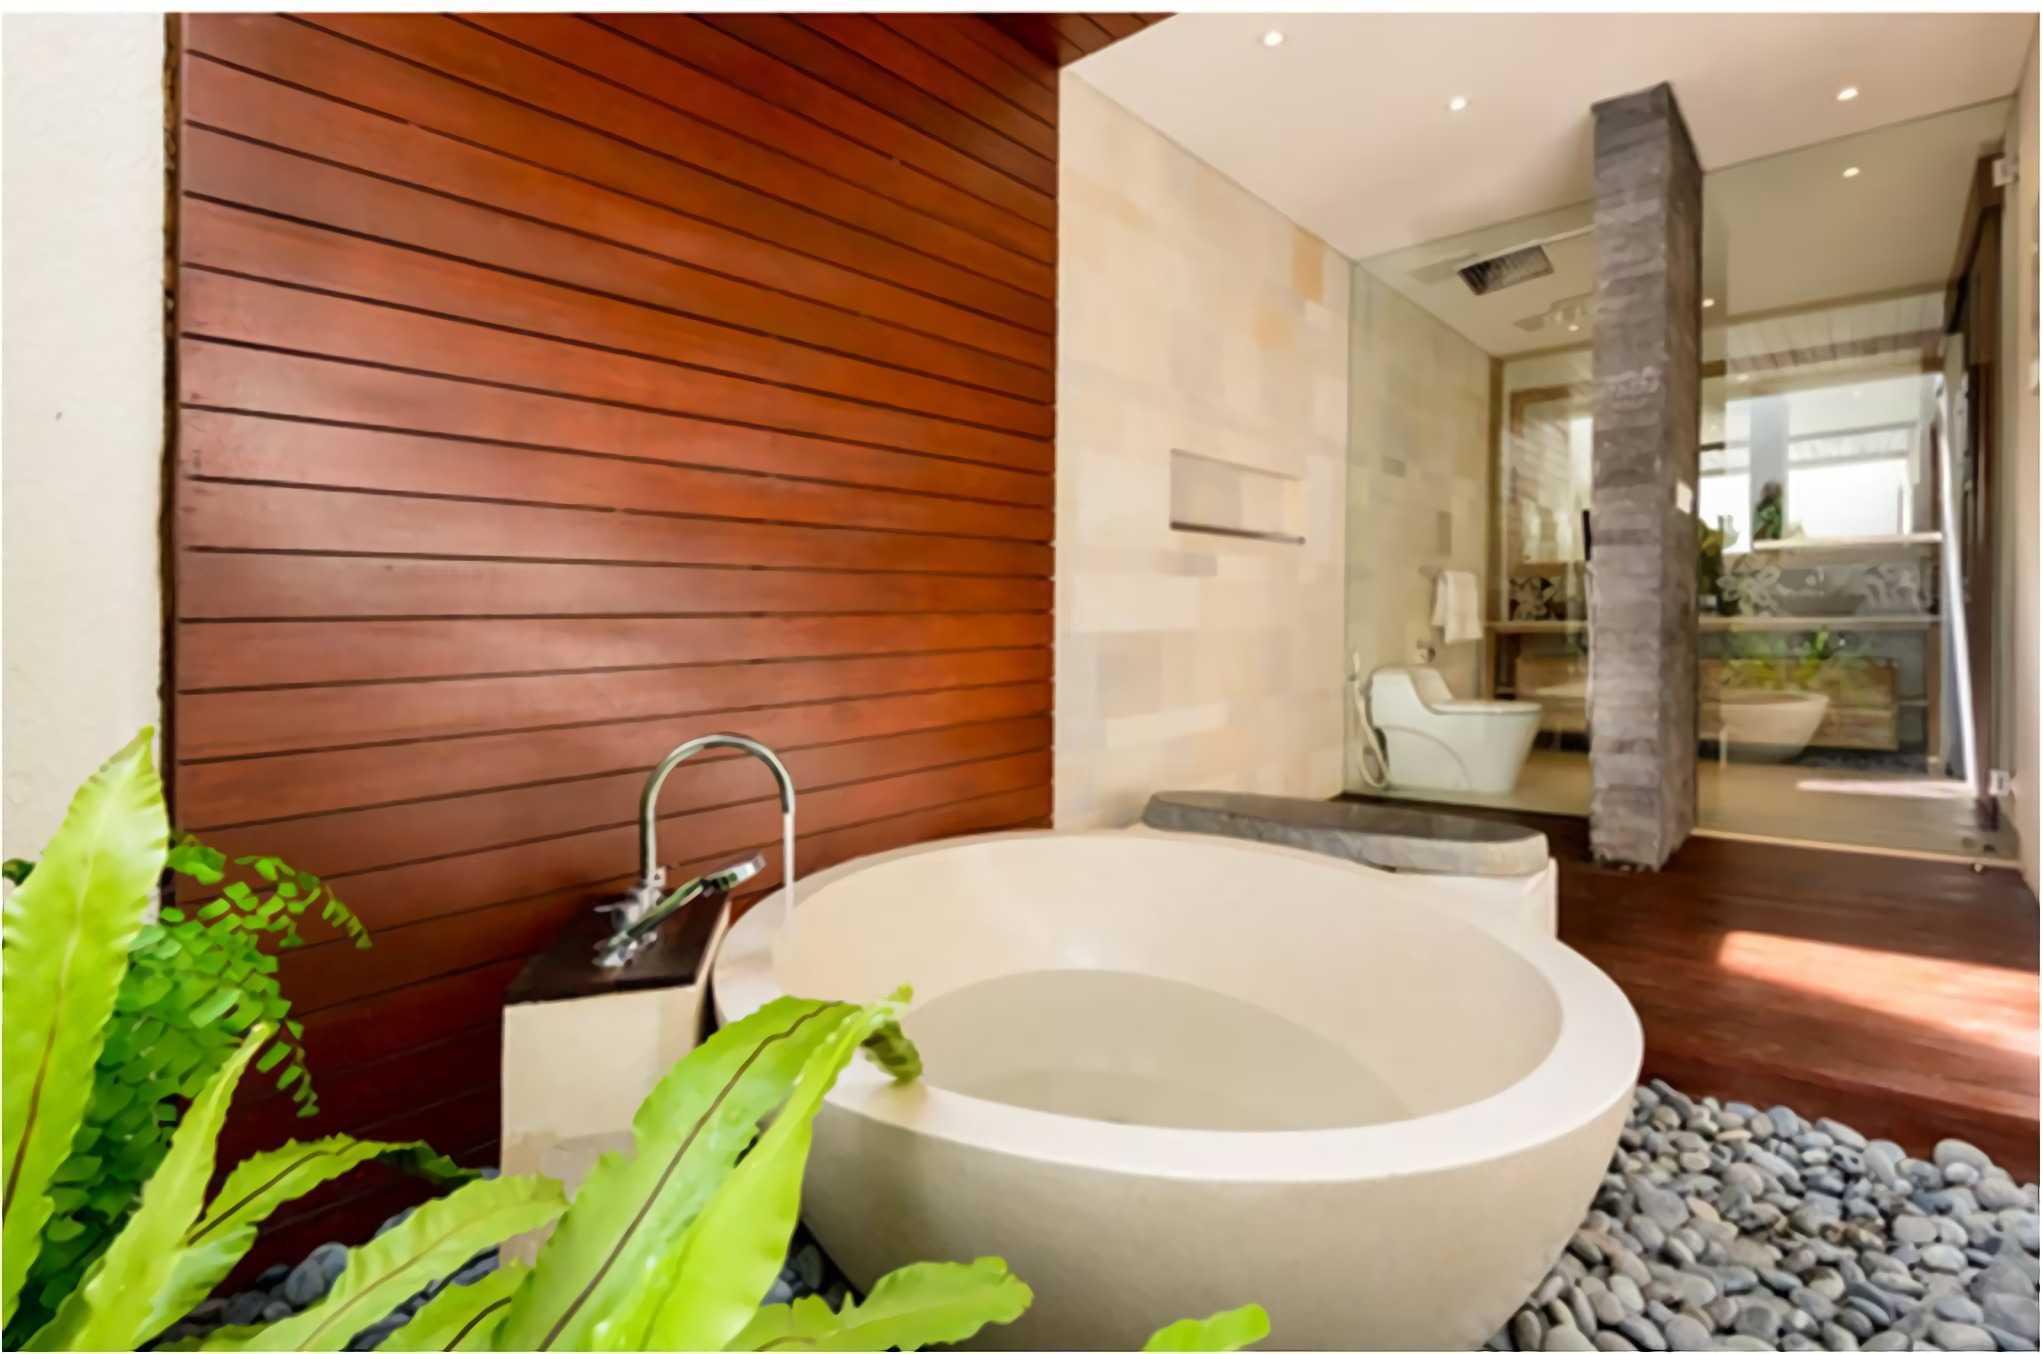 Hg Architects & Designers Associates Villa Saya Canggu, Bali Canggu, Bali Bathroom   24255